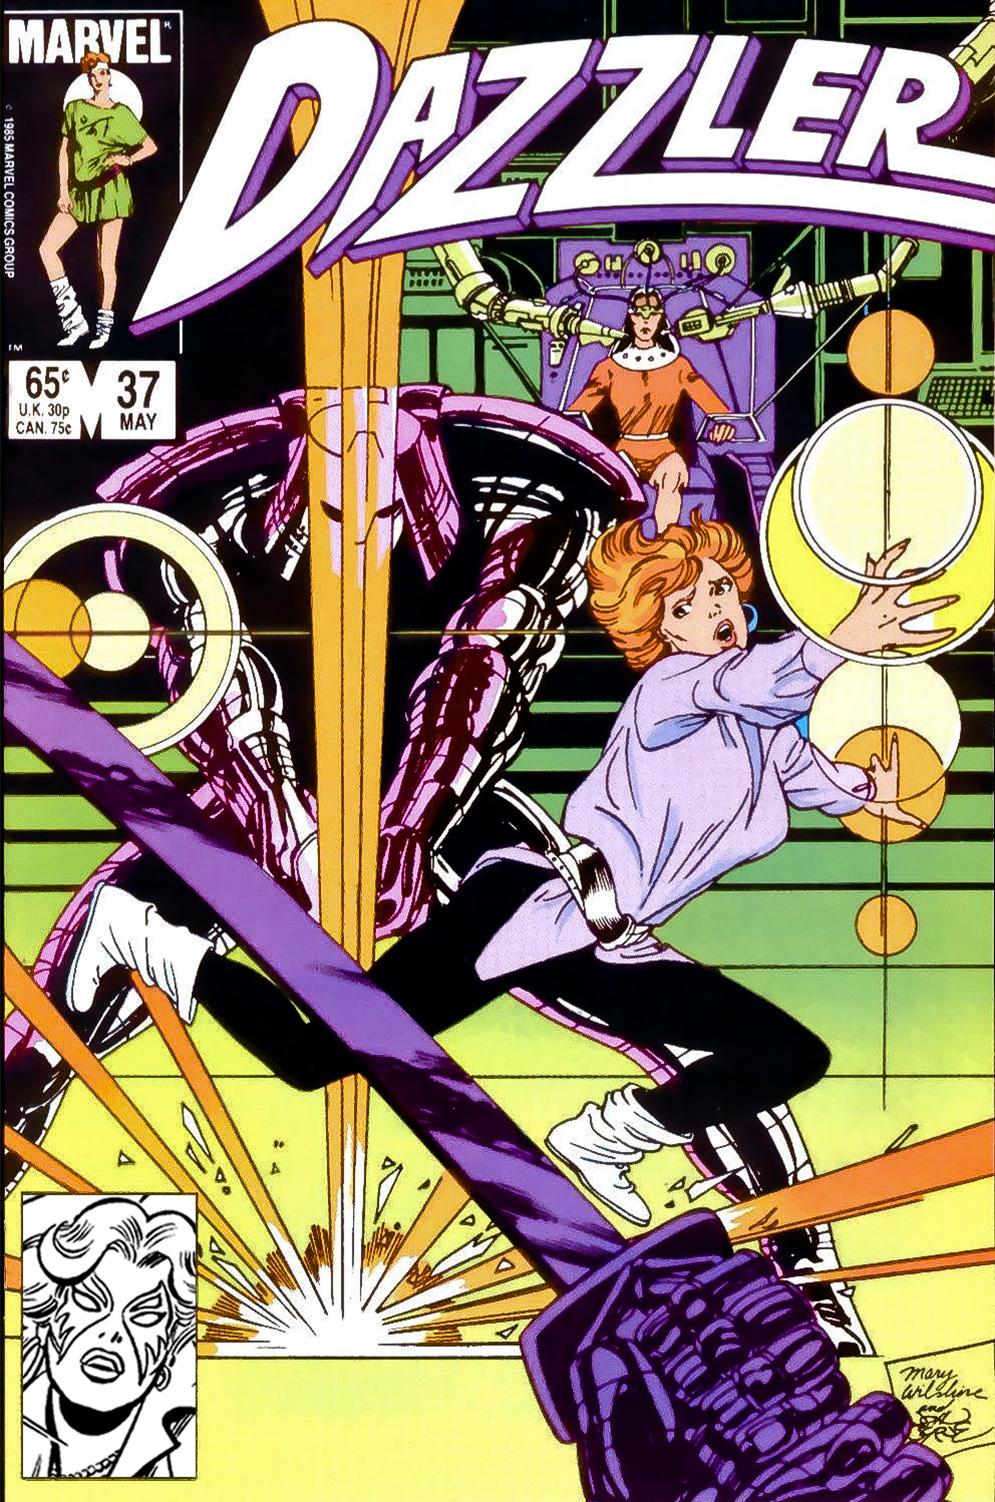 Dazzler (1981) #37